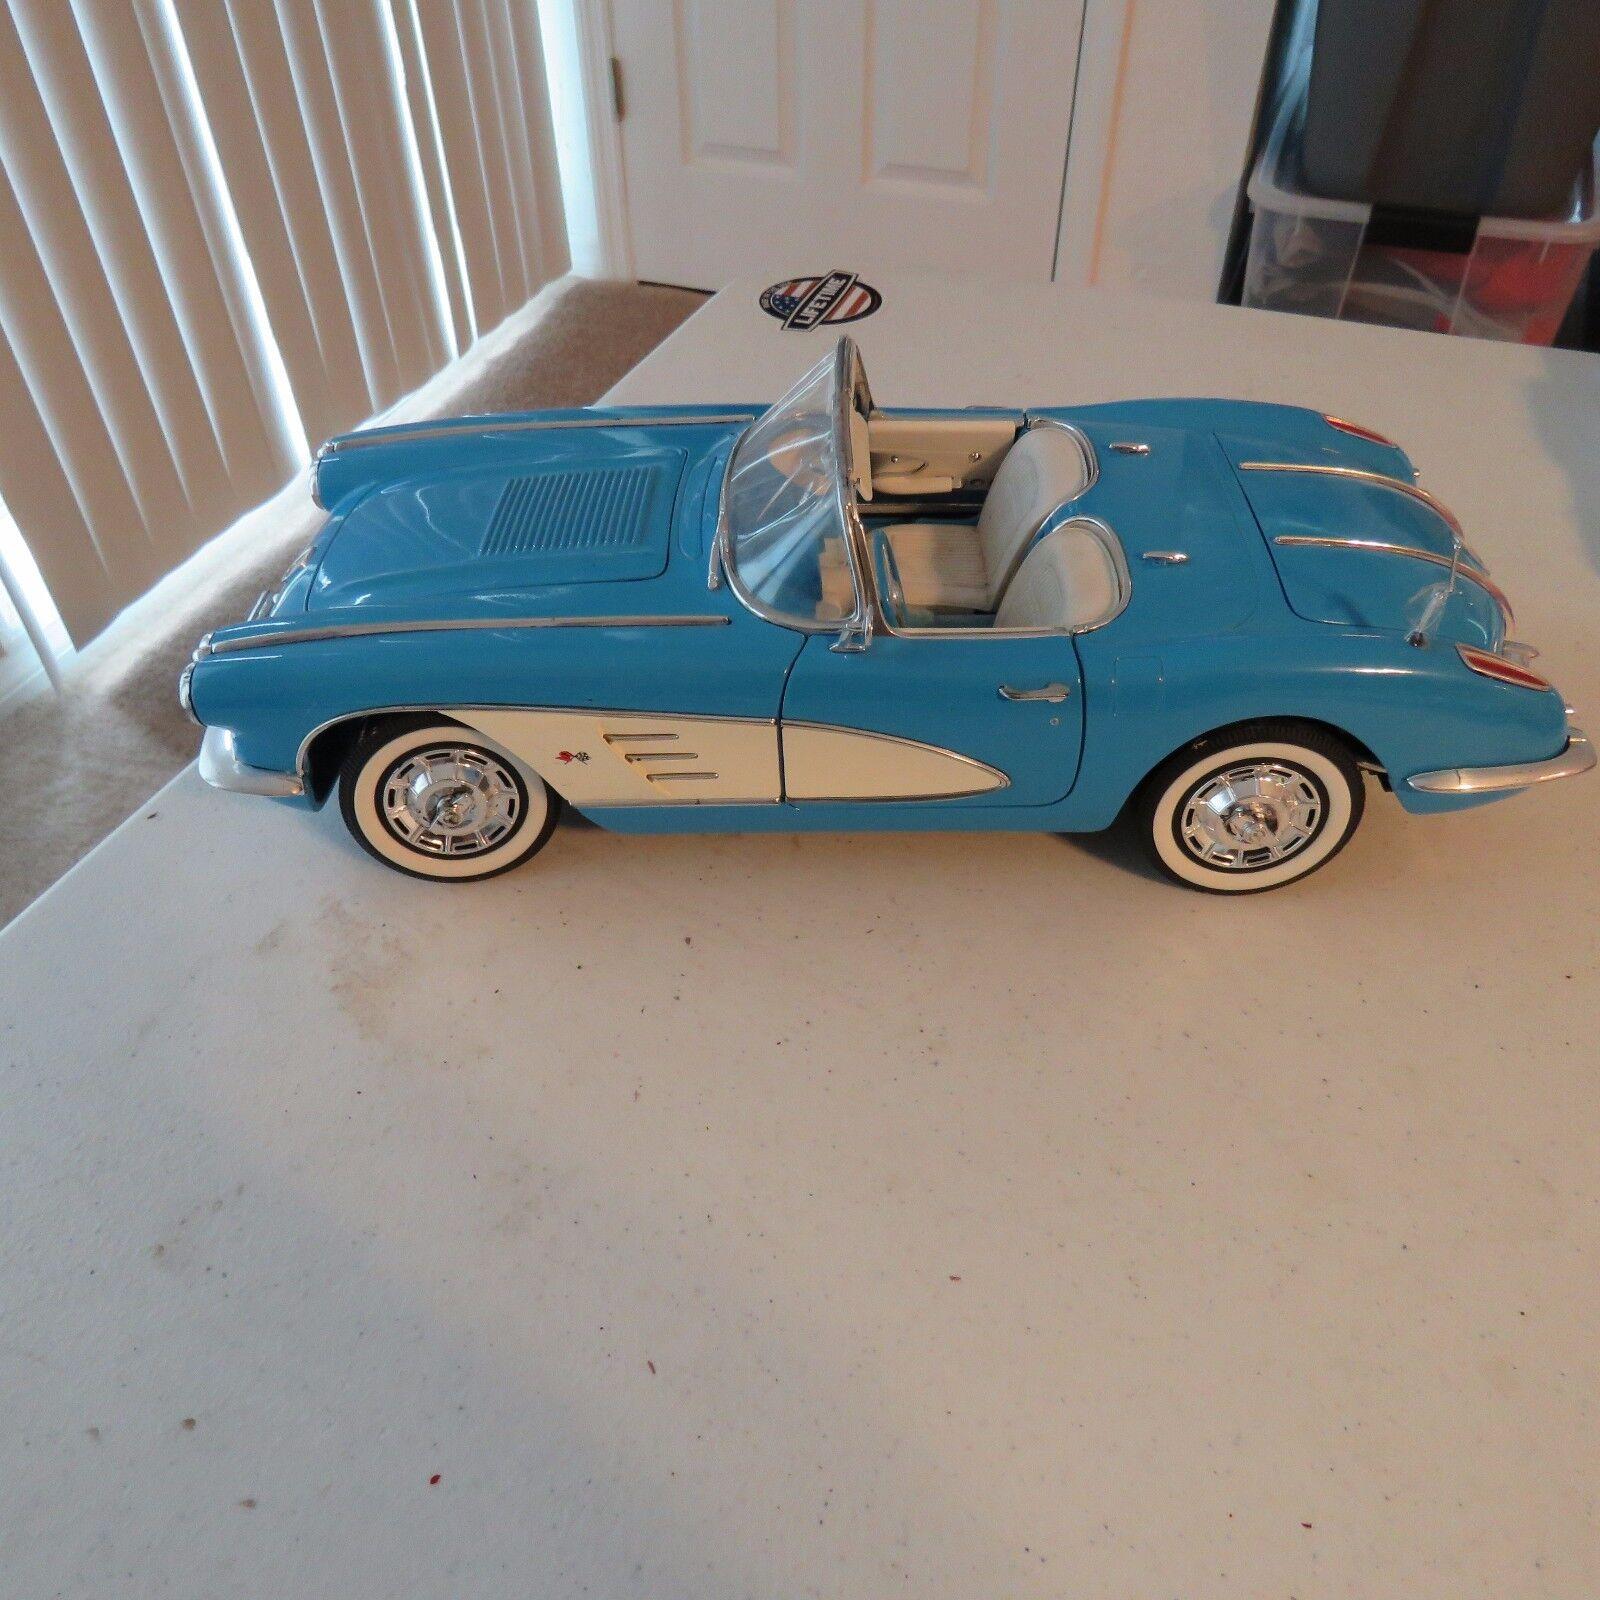 1958 chevy corvette coGrünible 13.12 uhr  kamelhaar skala druckguss getriebe spielzeug